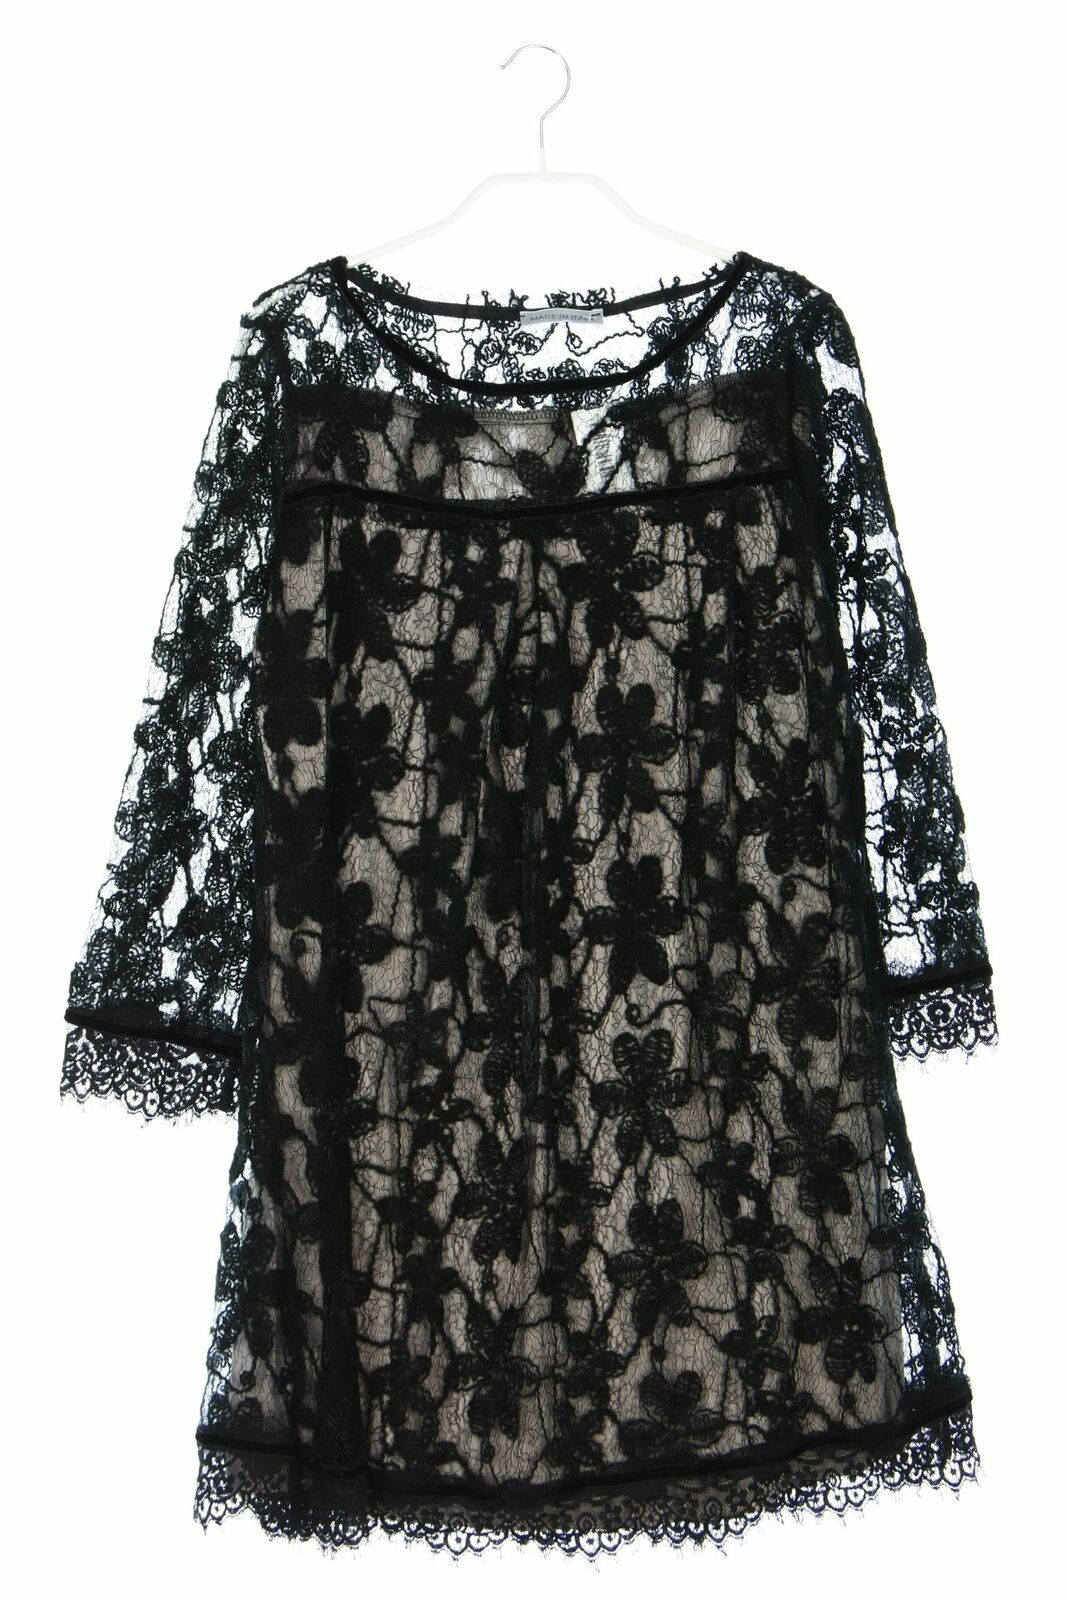 made in italy strick-kleid strick 7/8-Ärmel damen d 38 dress